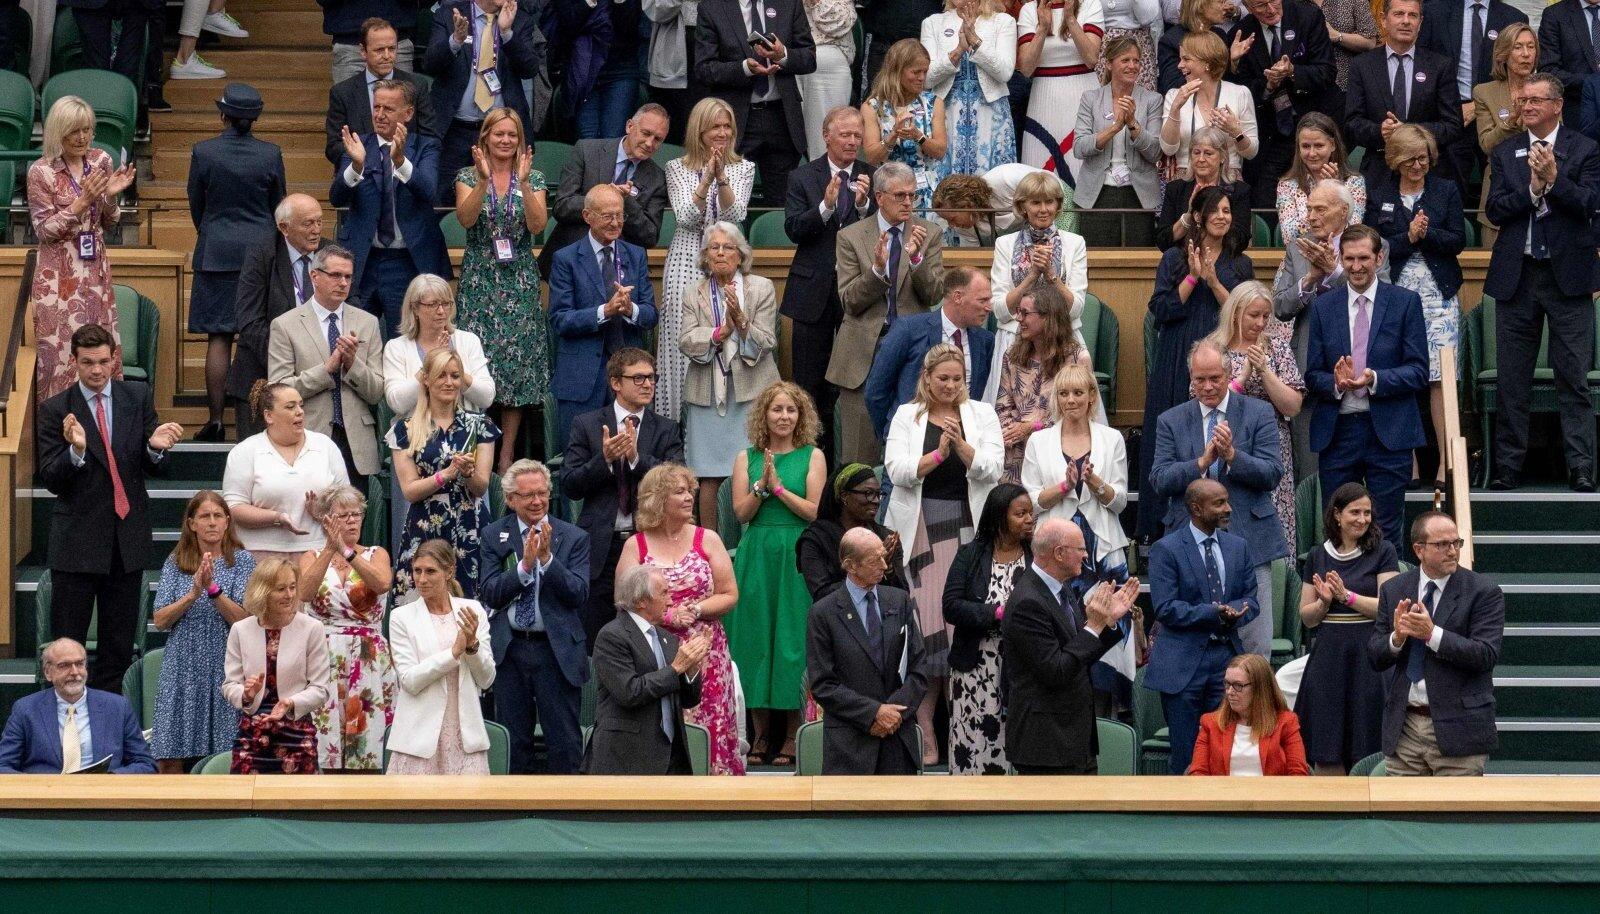 Wimbledoni publik aplodeerib Sarah Gilbertile (all paremas nurgas istumas).